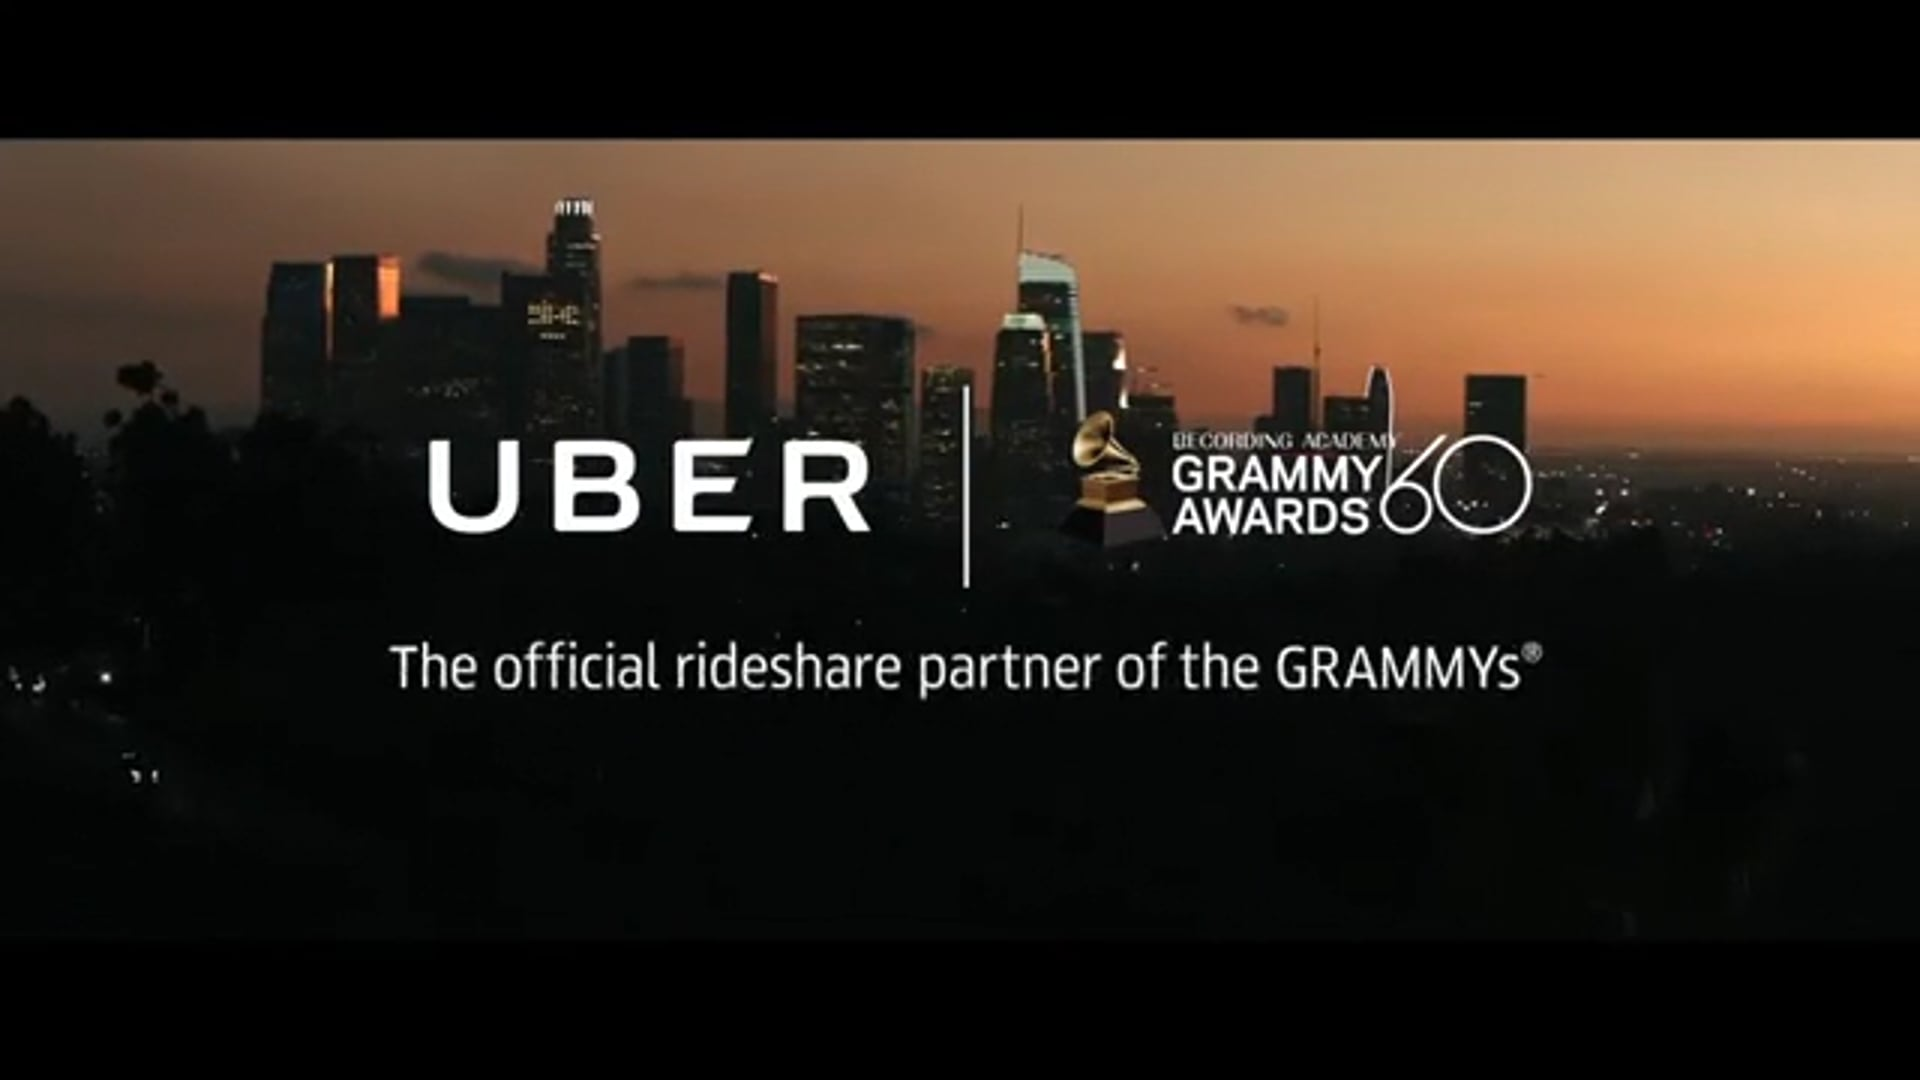 UBER - Julia Michaels - Road to Best New Artist nominee